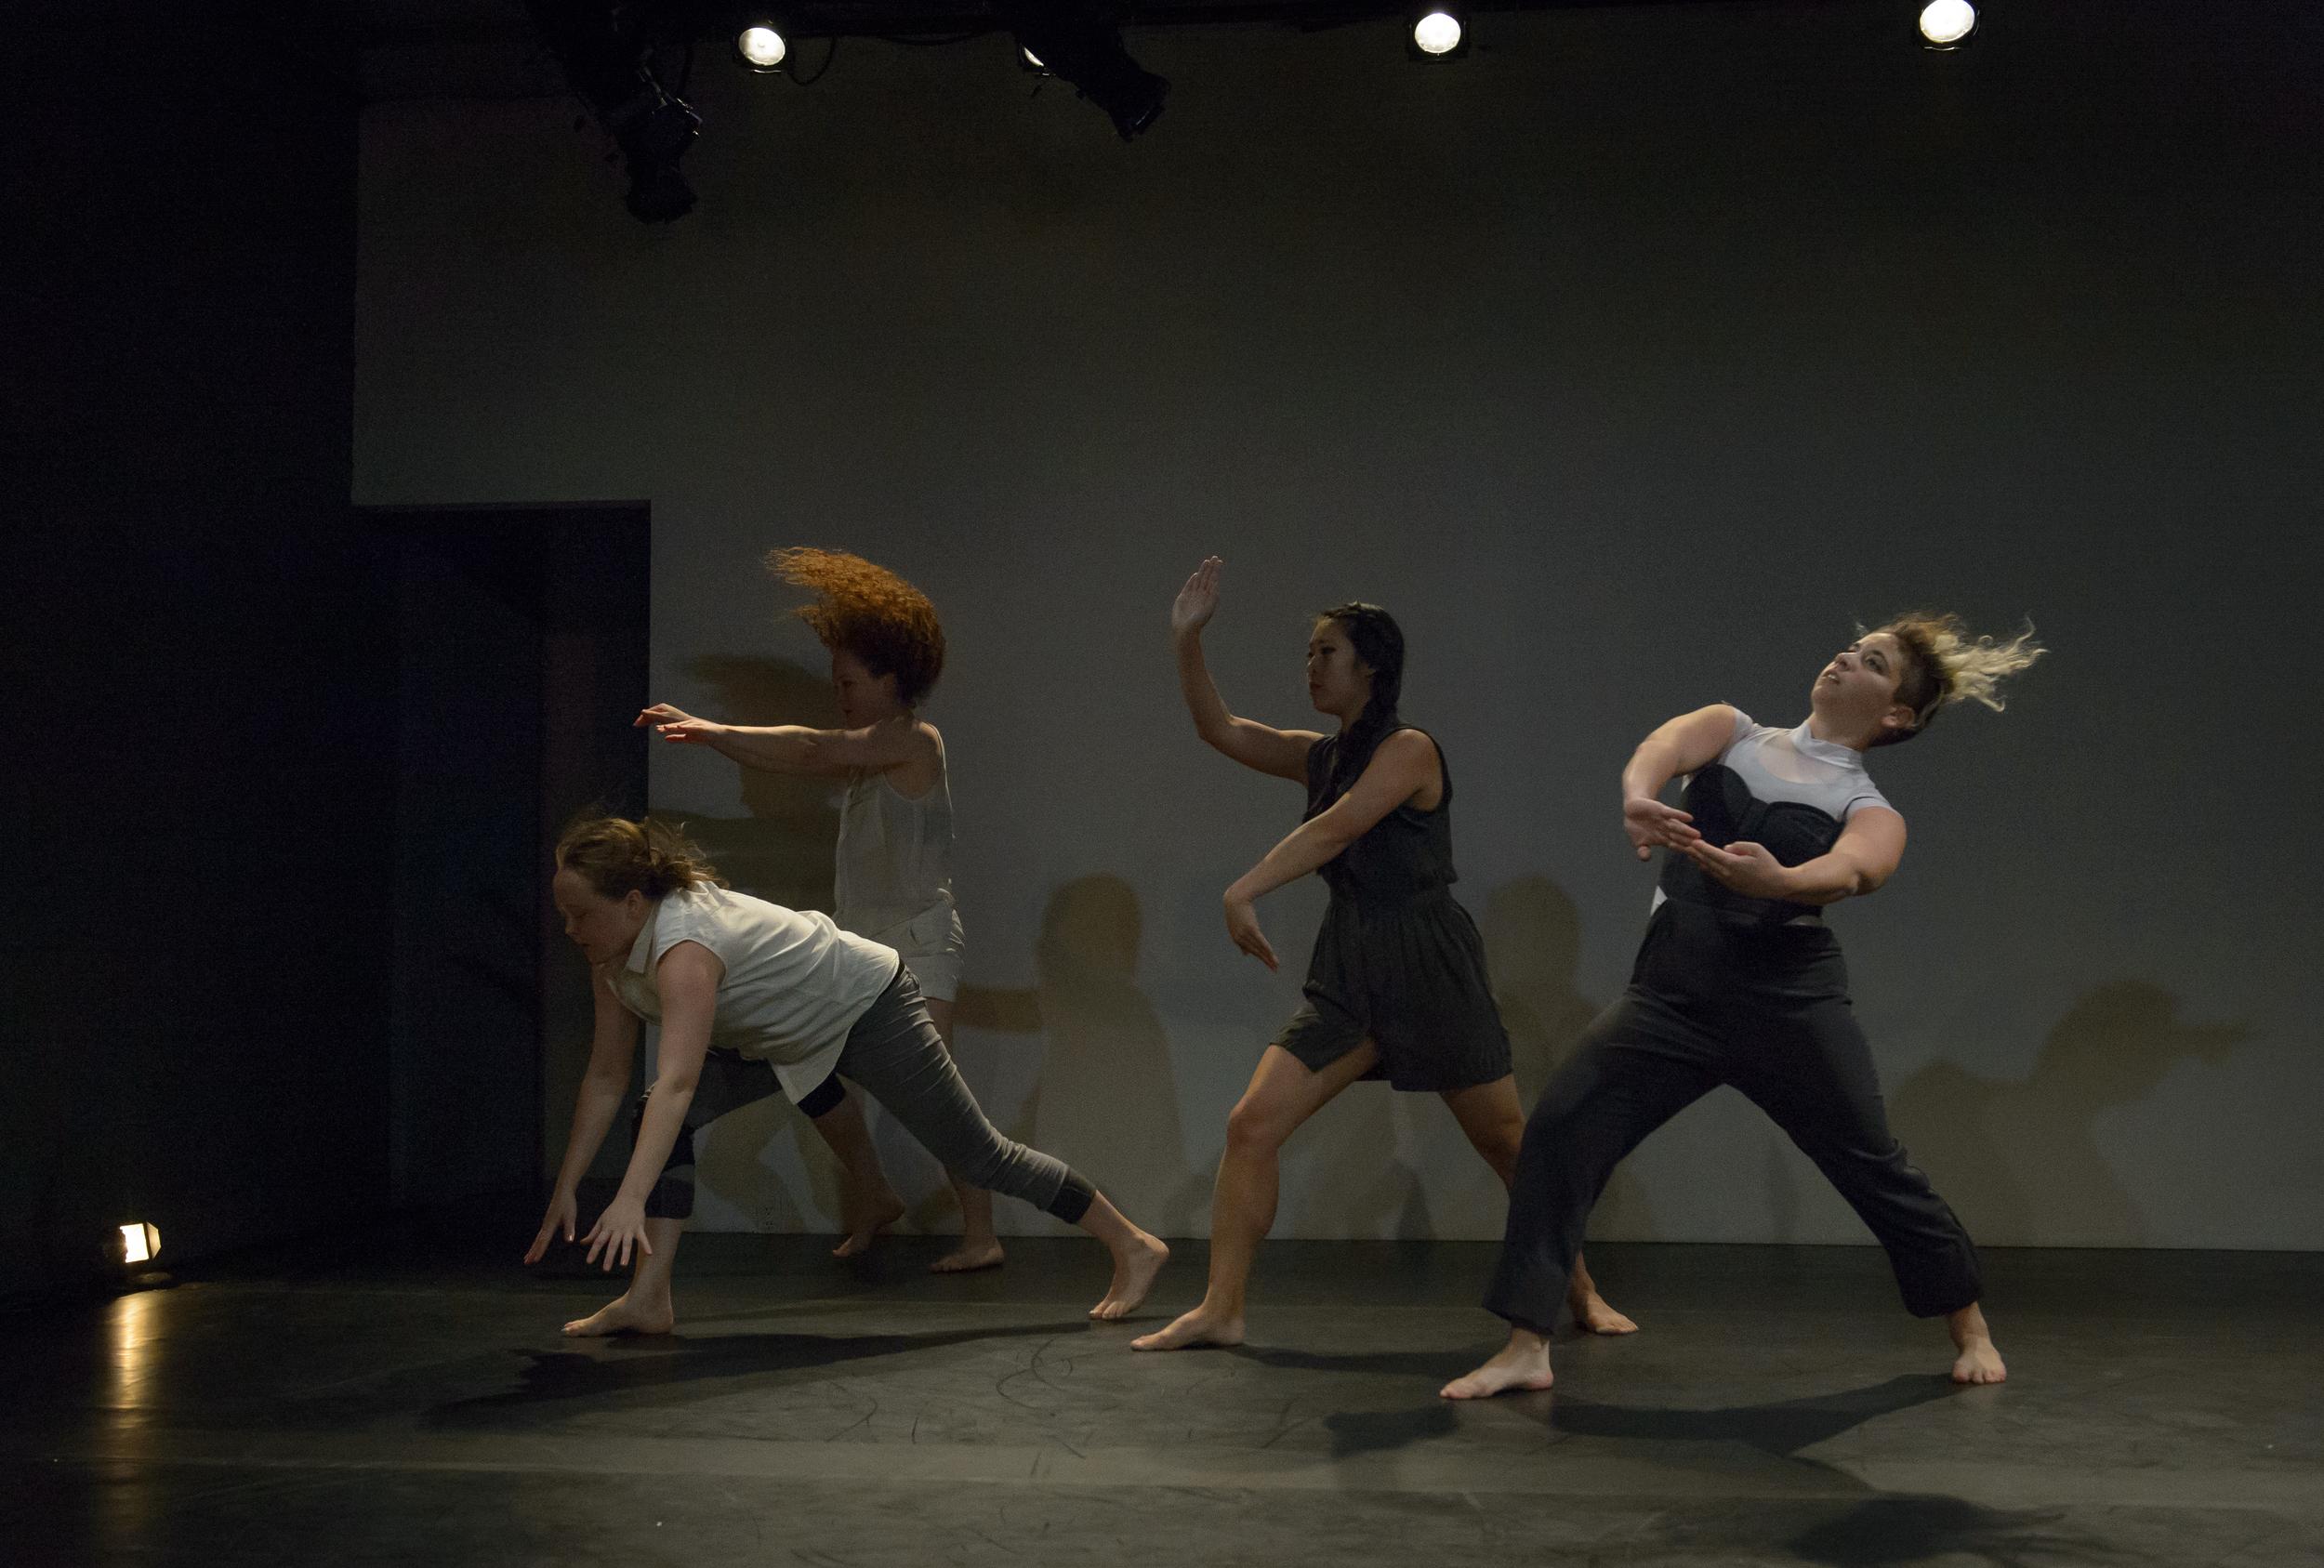 Sophie Sotsky // TYKE Dance. August 2014. Photo: Corey Melton.